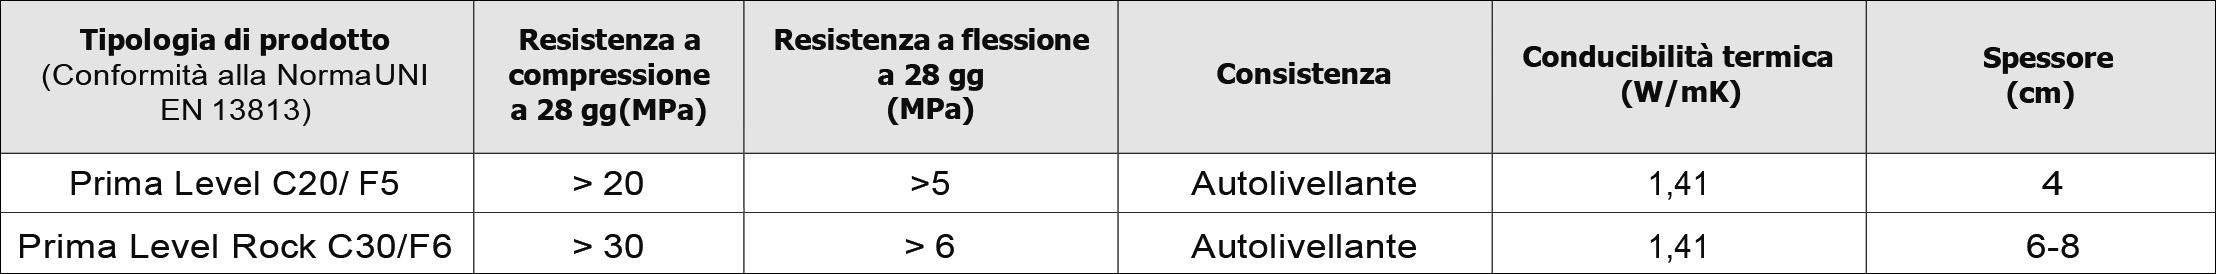 cassetti autolivellanti dati tecnici